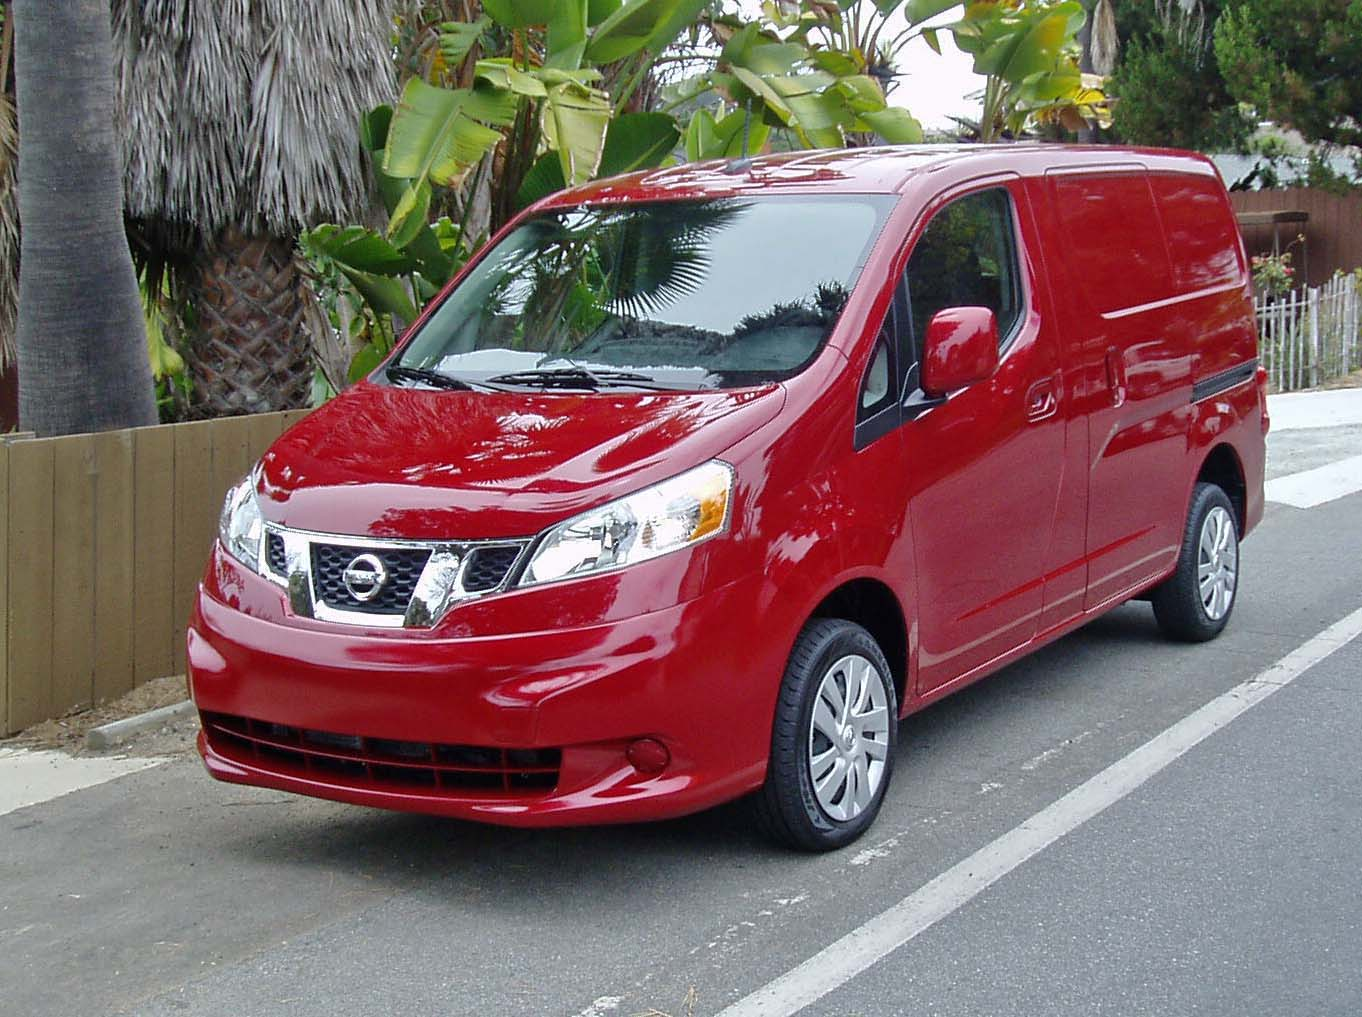 2013 Nissan NV200 Compact Cargo Van Test Drivenbsp